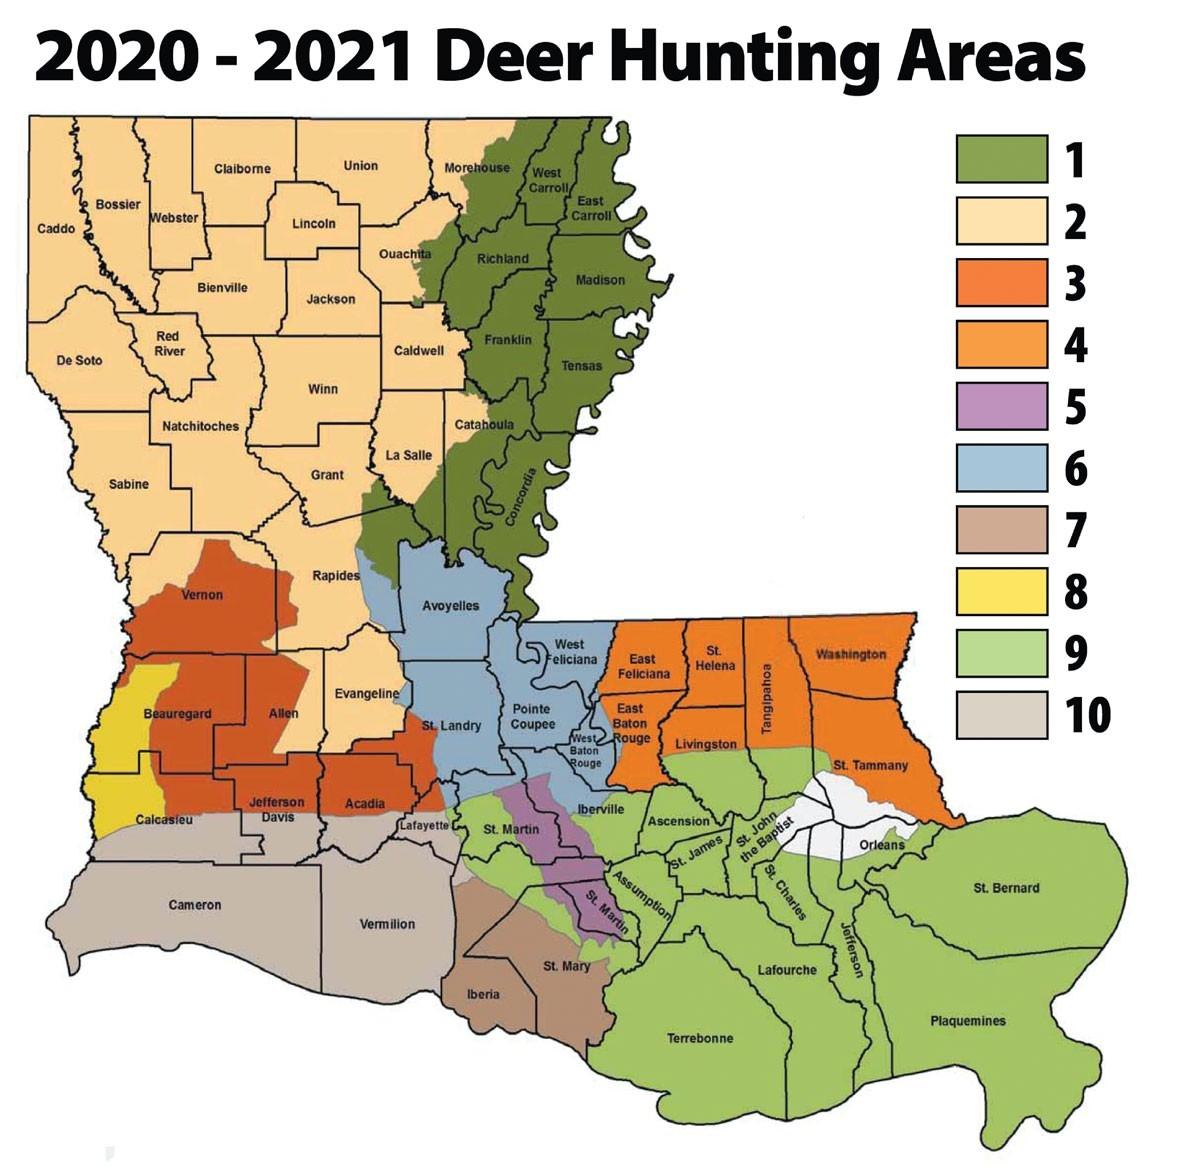 Louisiana'S 2020 Rut Report - Louisiana Sportsman  Whitetail Rut Prediction 2021